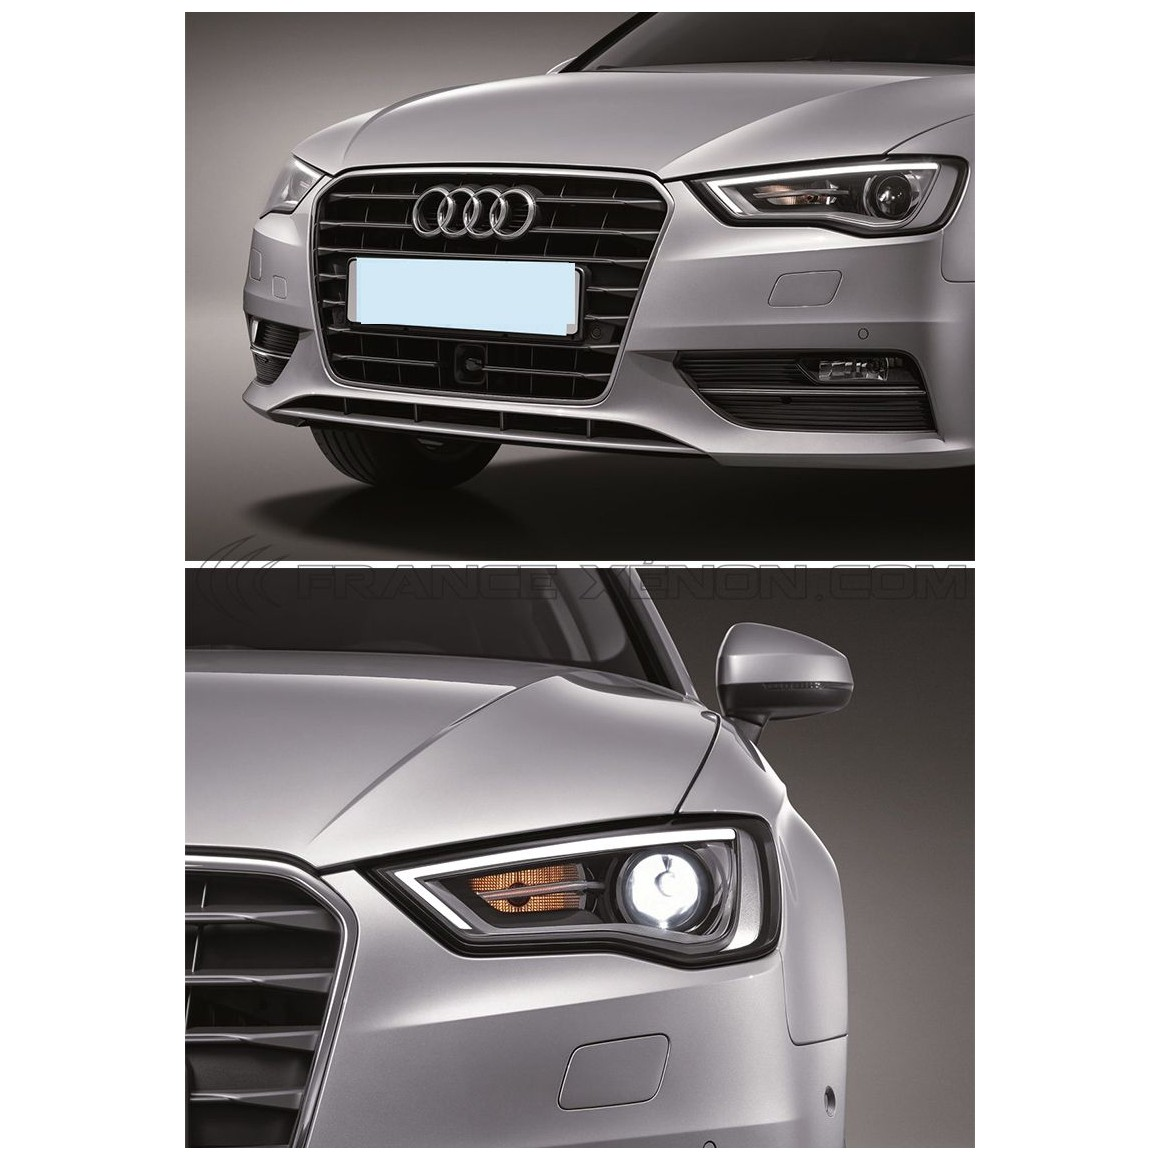 2x Headlights Audi A3 8V Full Xénon / LED - France-Xenon